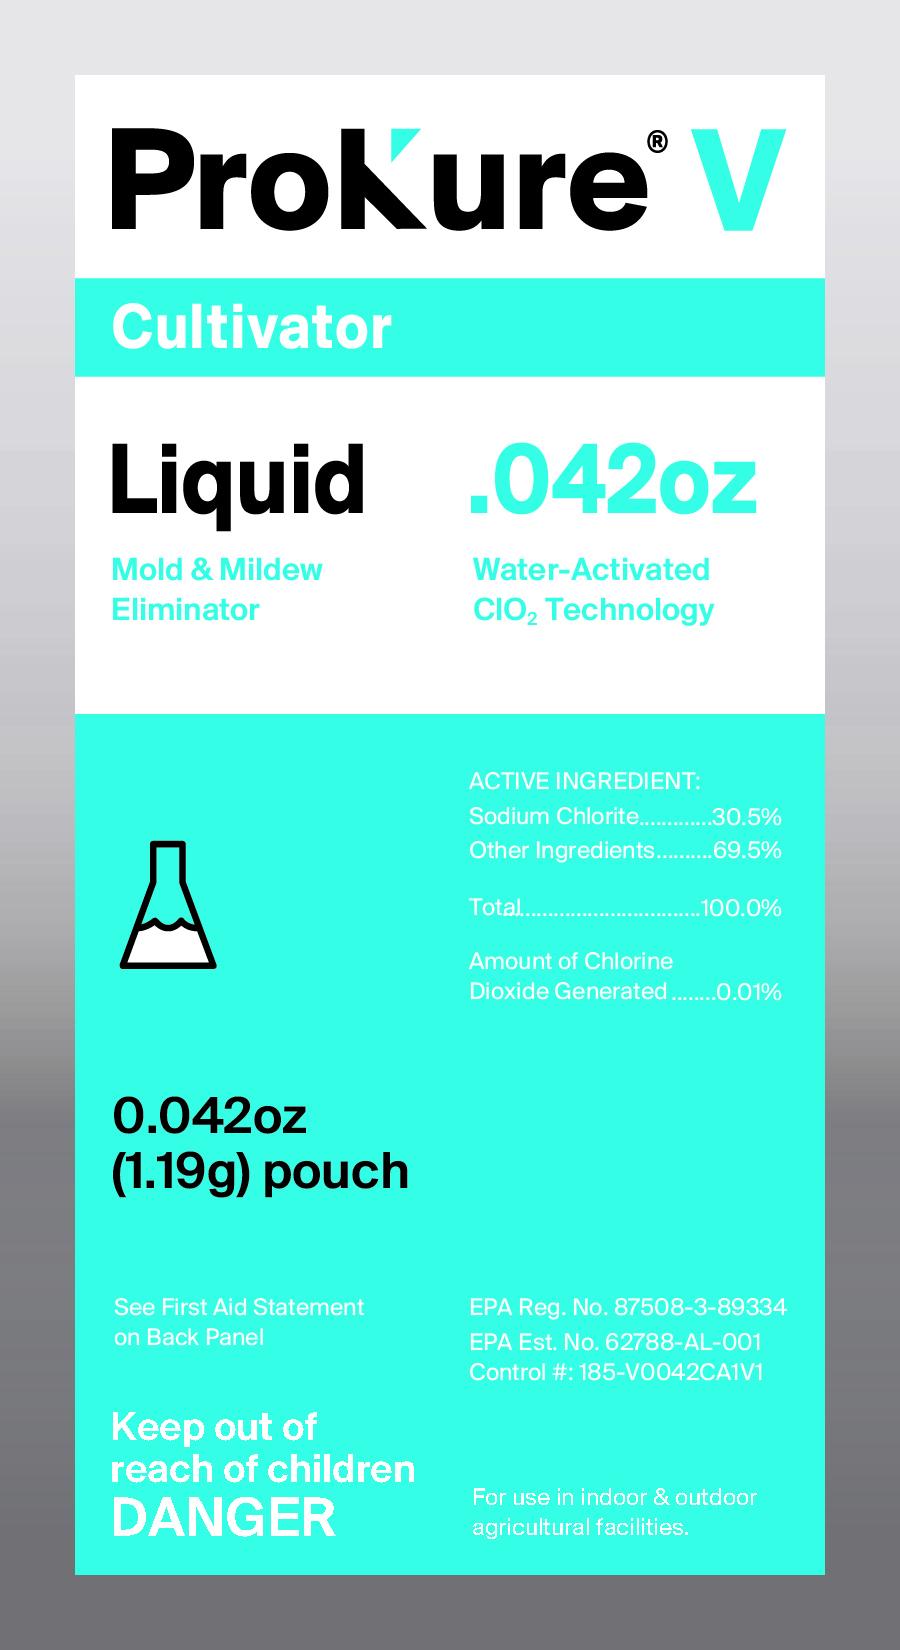 ProKure Liquid. 32oz - ProKure V Liquid, Mold & Mildew Eliminator, Disinfectant/Fungicide/Deodorizer(EPA Reg # 87508-3-89334; EPA Est #62788-AL-001)